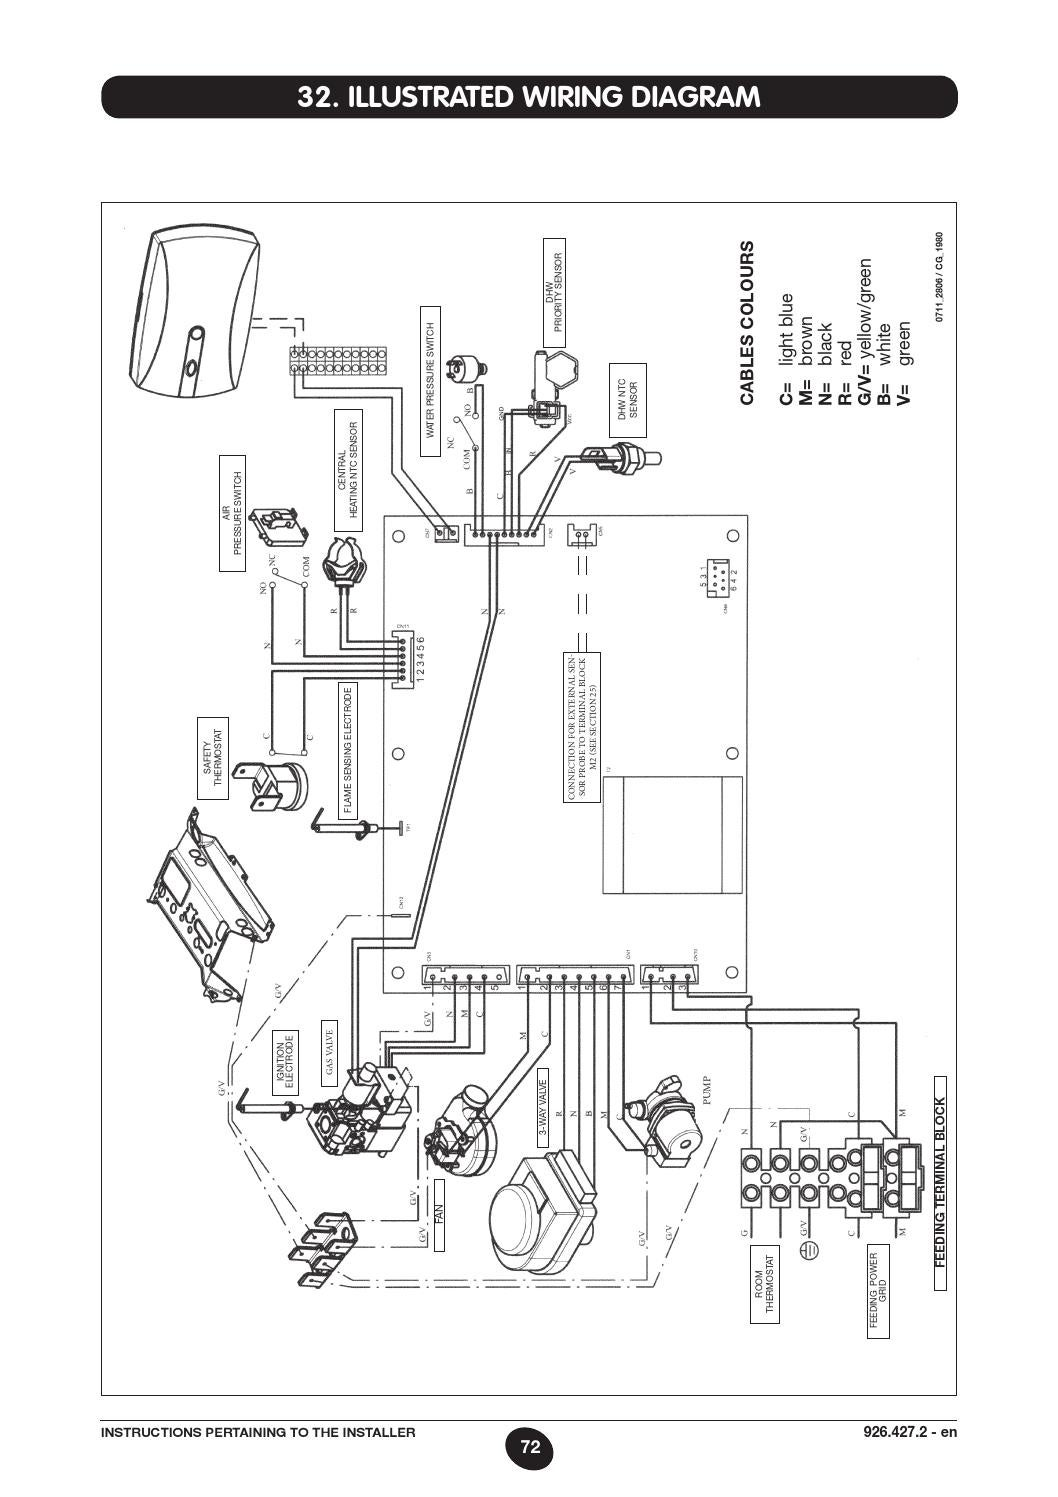 Atv312 Wiring Diagram